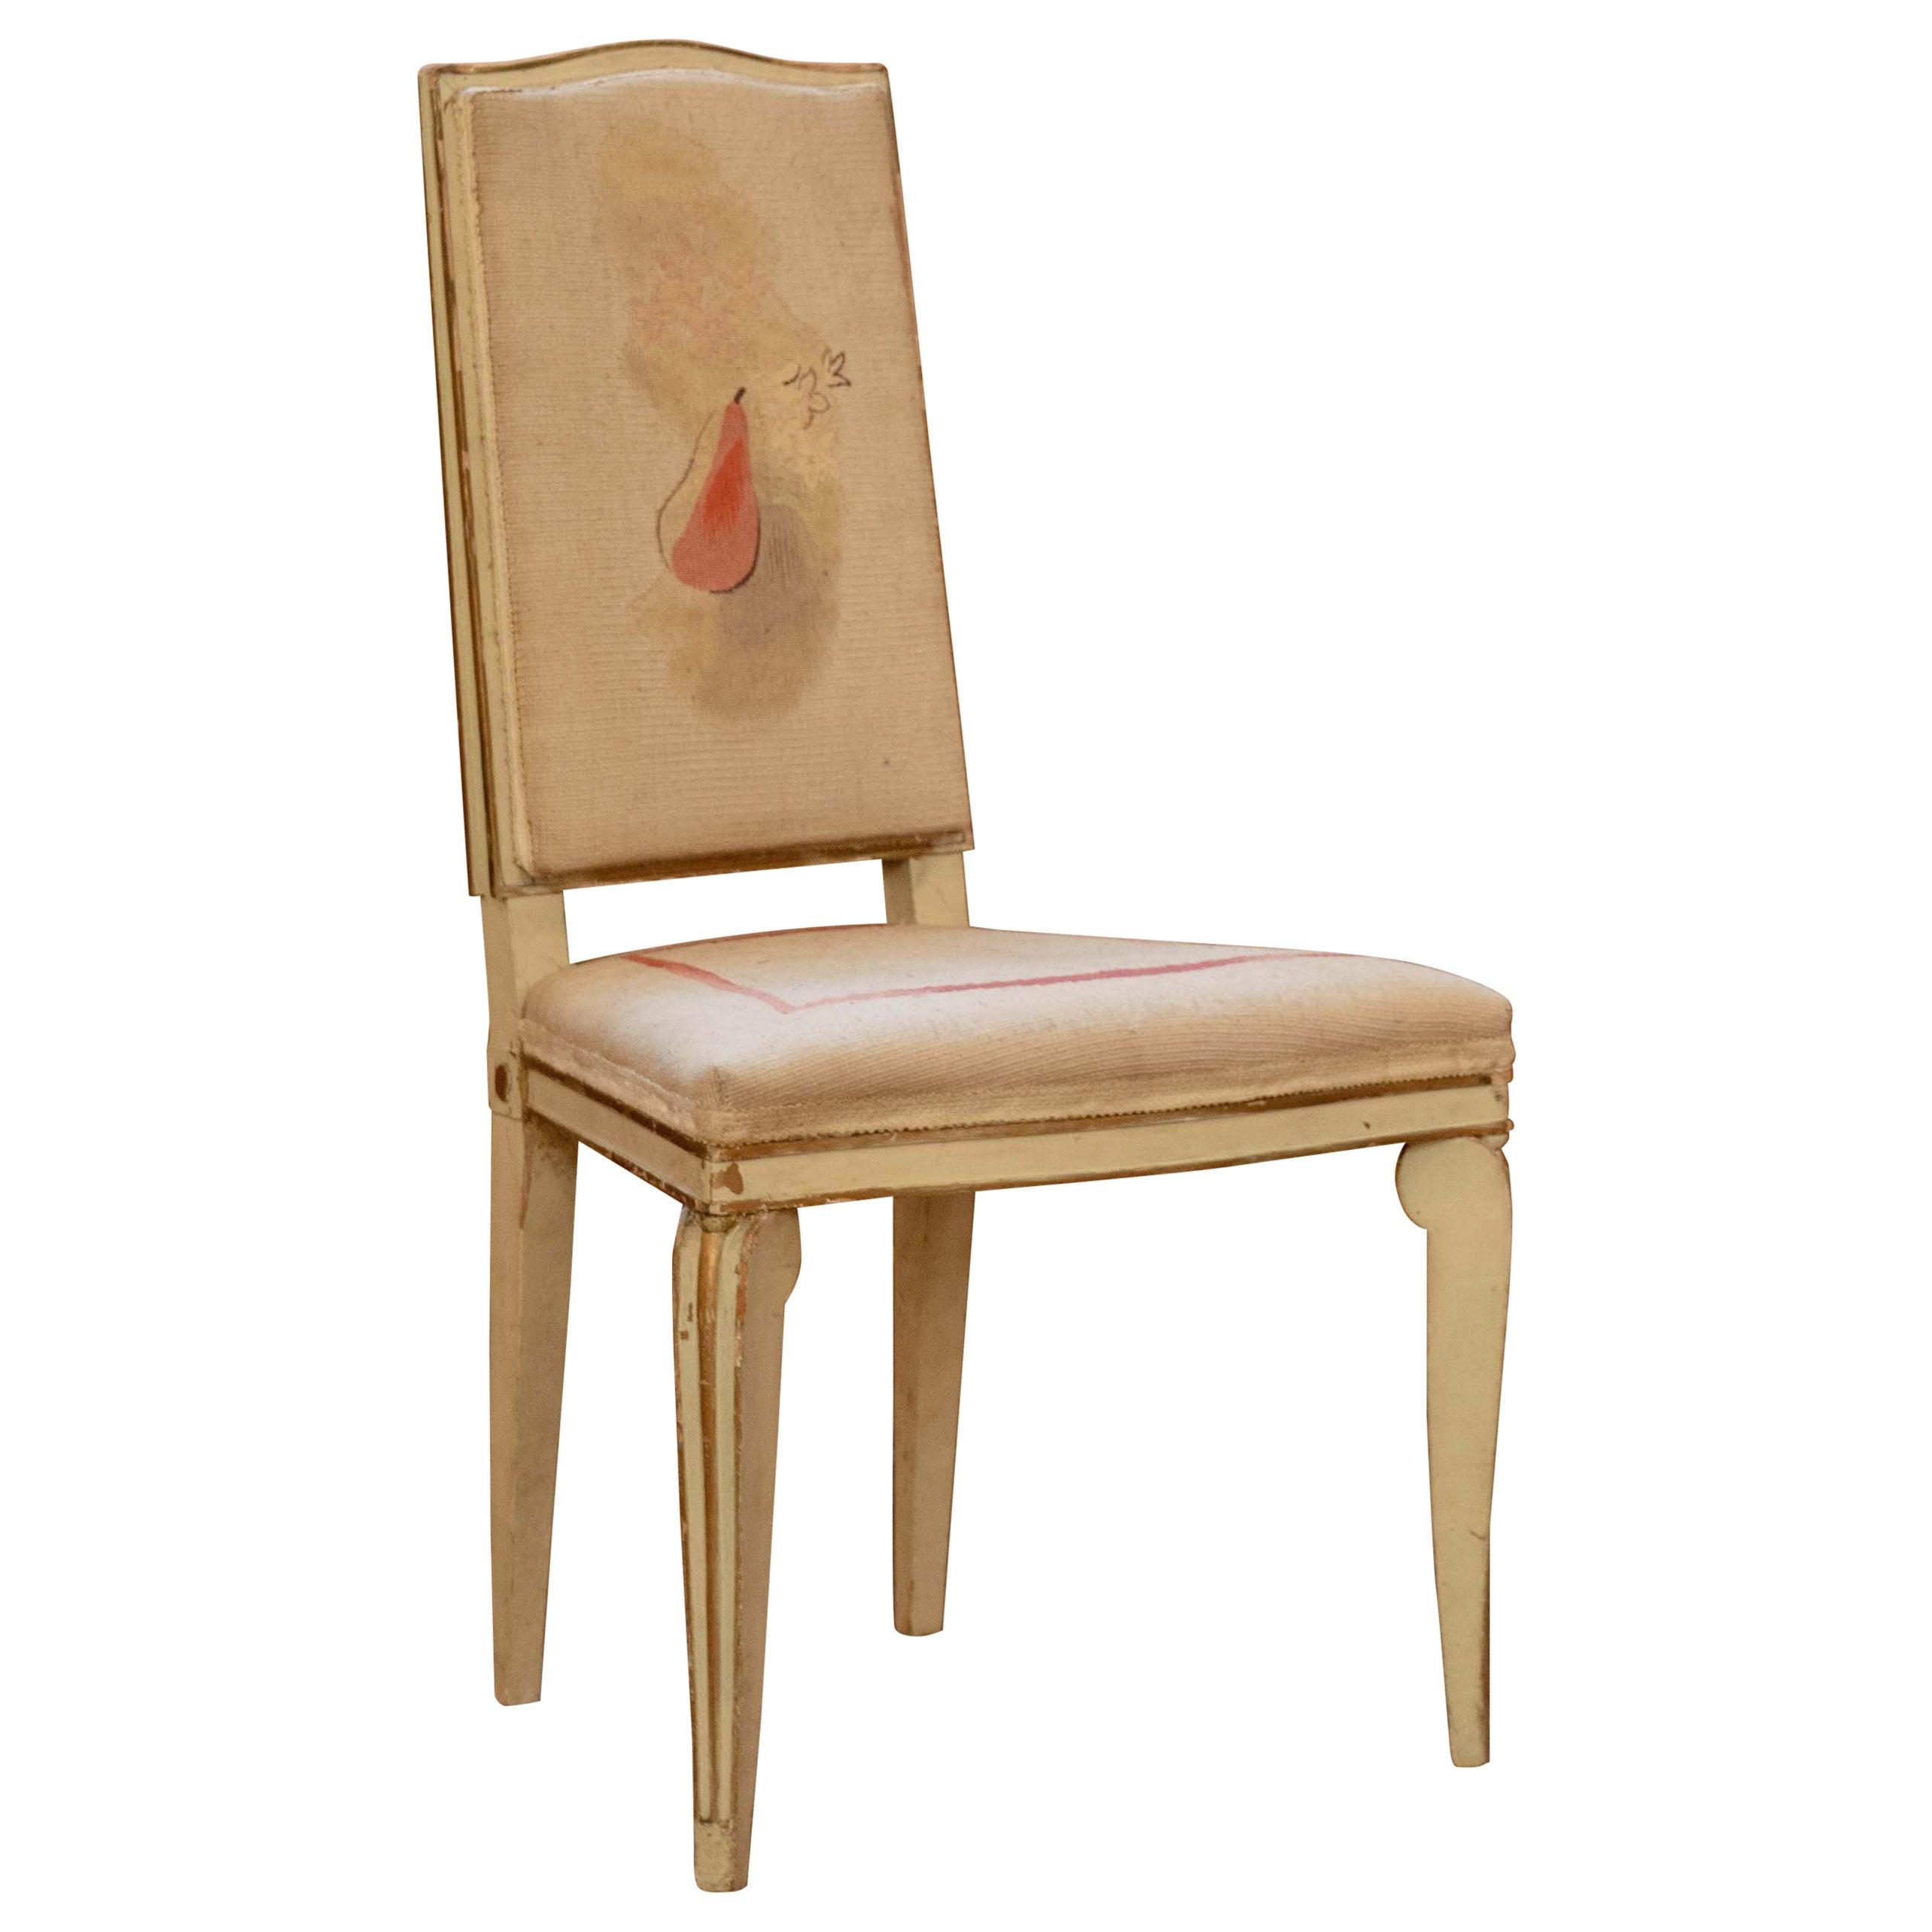 André Arbus Chair, circa 1940s